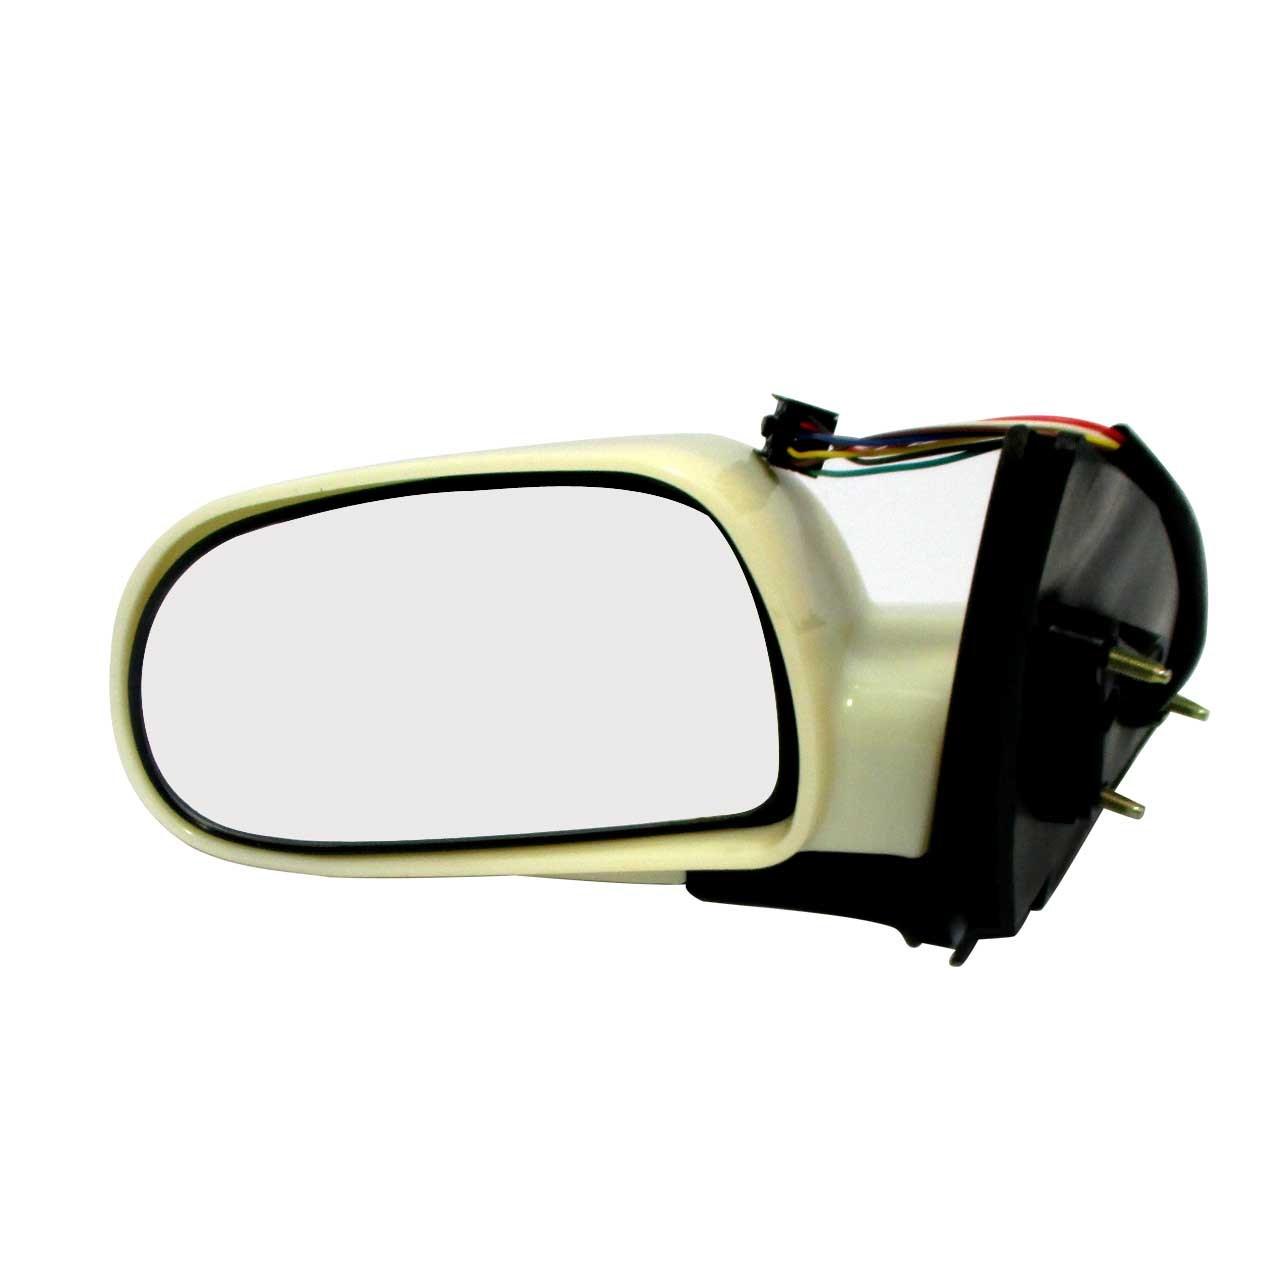 آینه چپ جیلی EC7 و RV7 مدل 1067001017